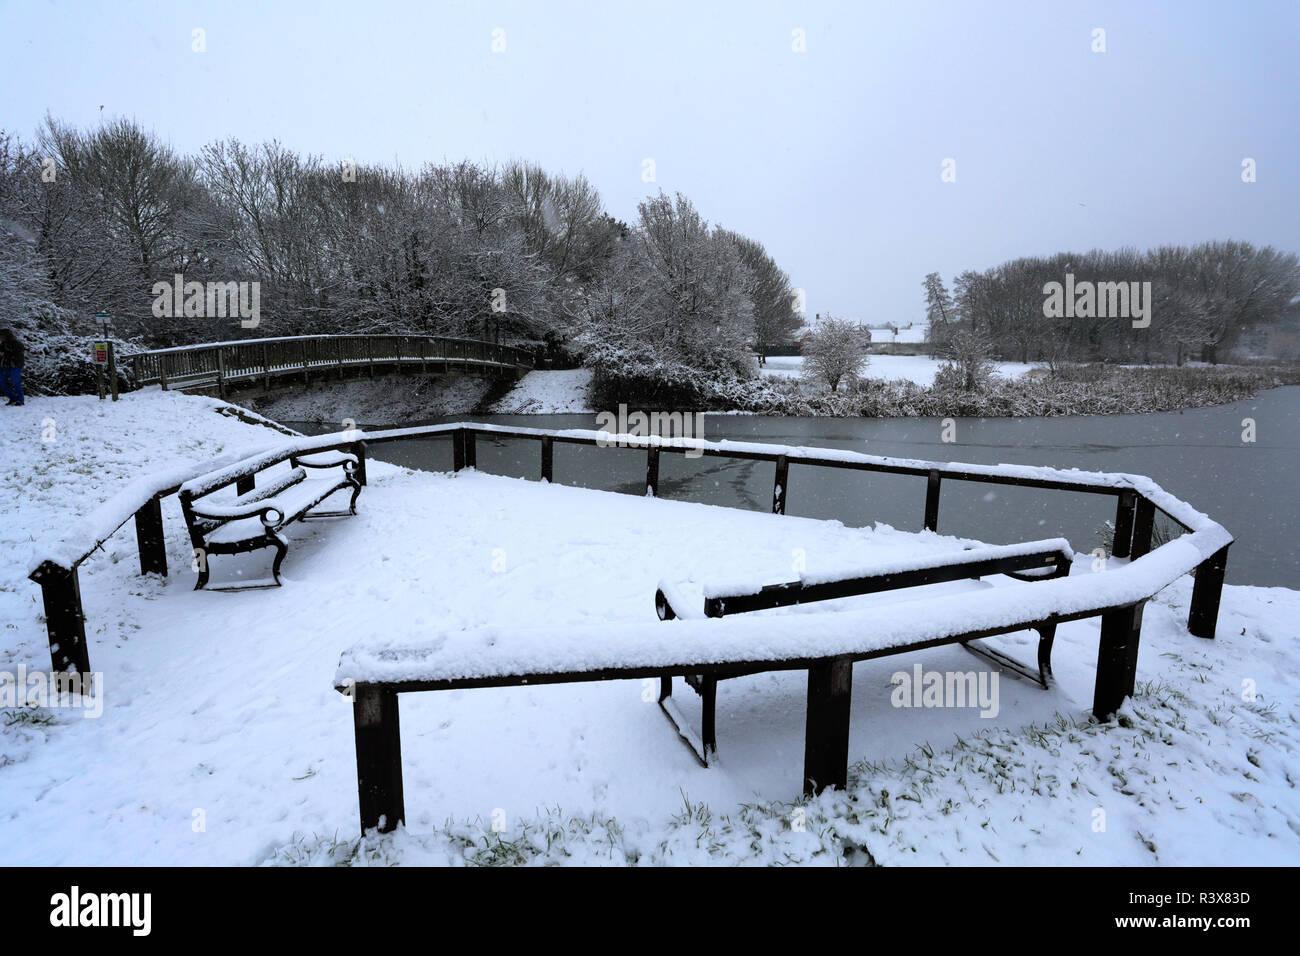 Snow at Cuckoos Hollow lakeside, Werrington Village, Cambridgeshire, England, UK - Stock Image